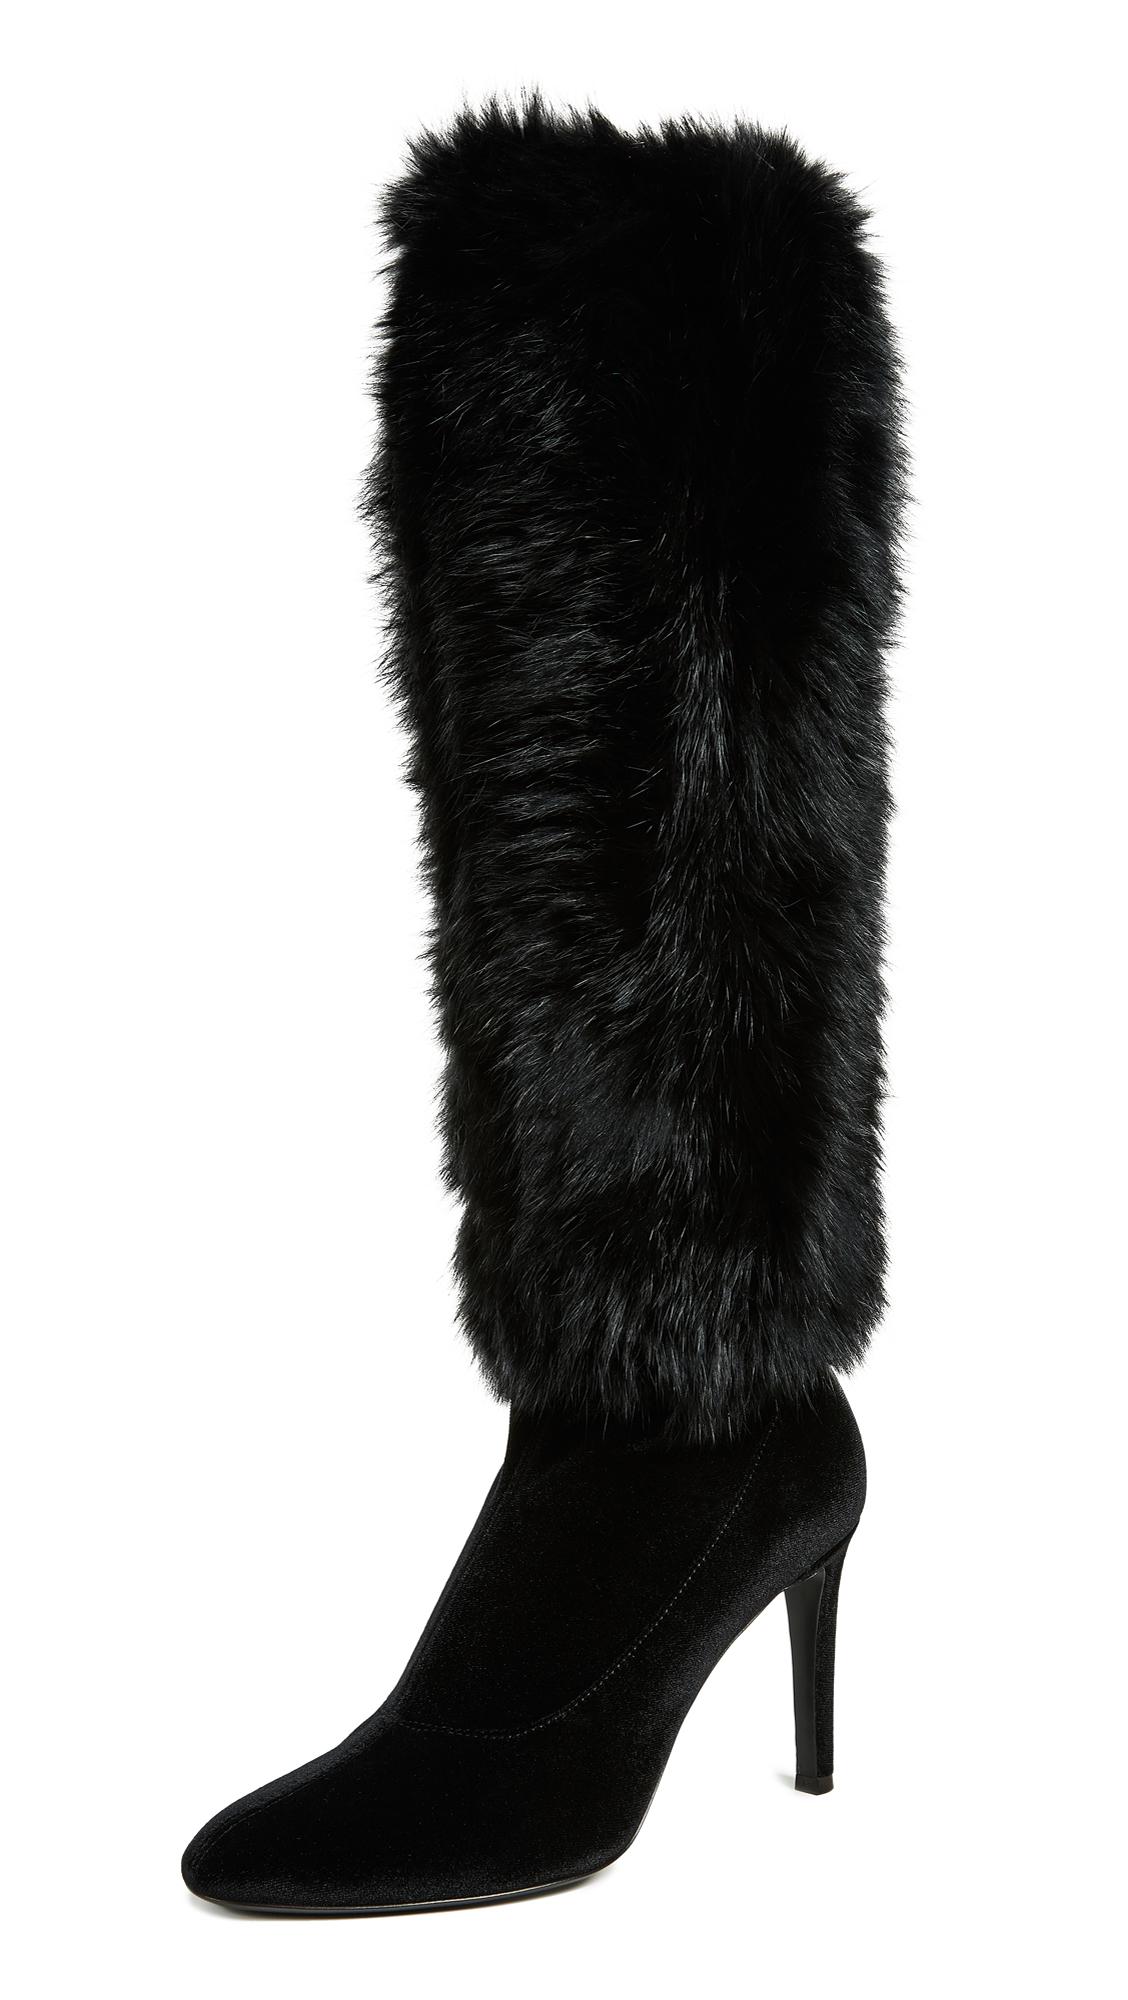 Giuseppe Zanotti Knee High Fur Boots - Nero